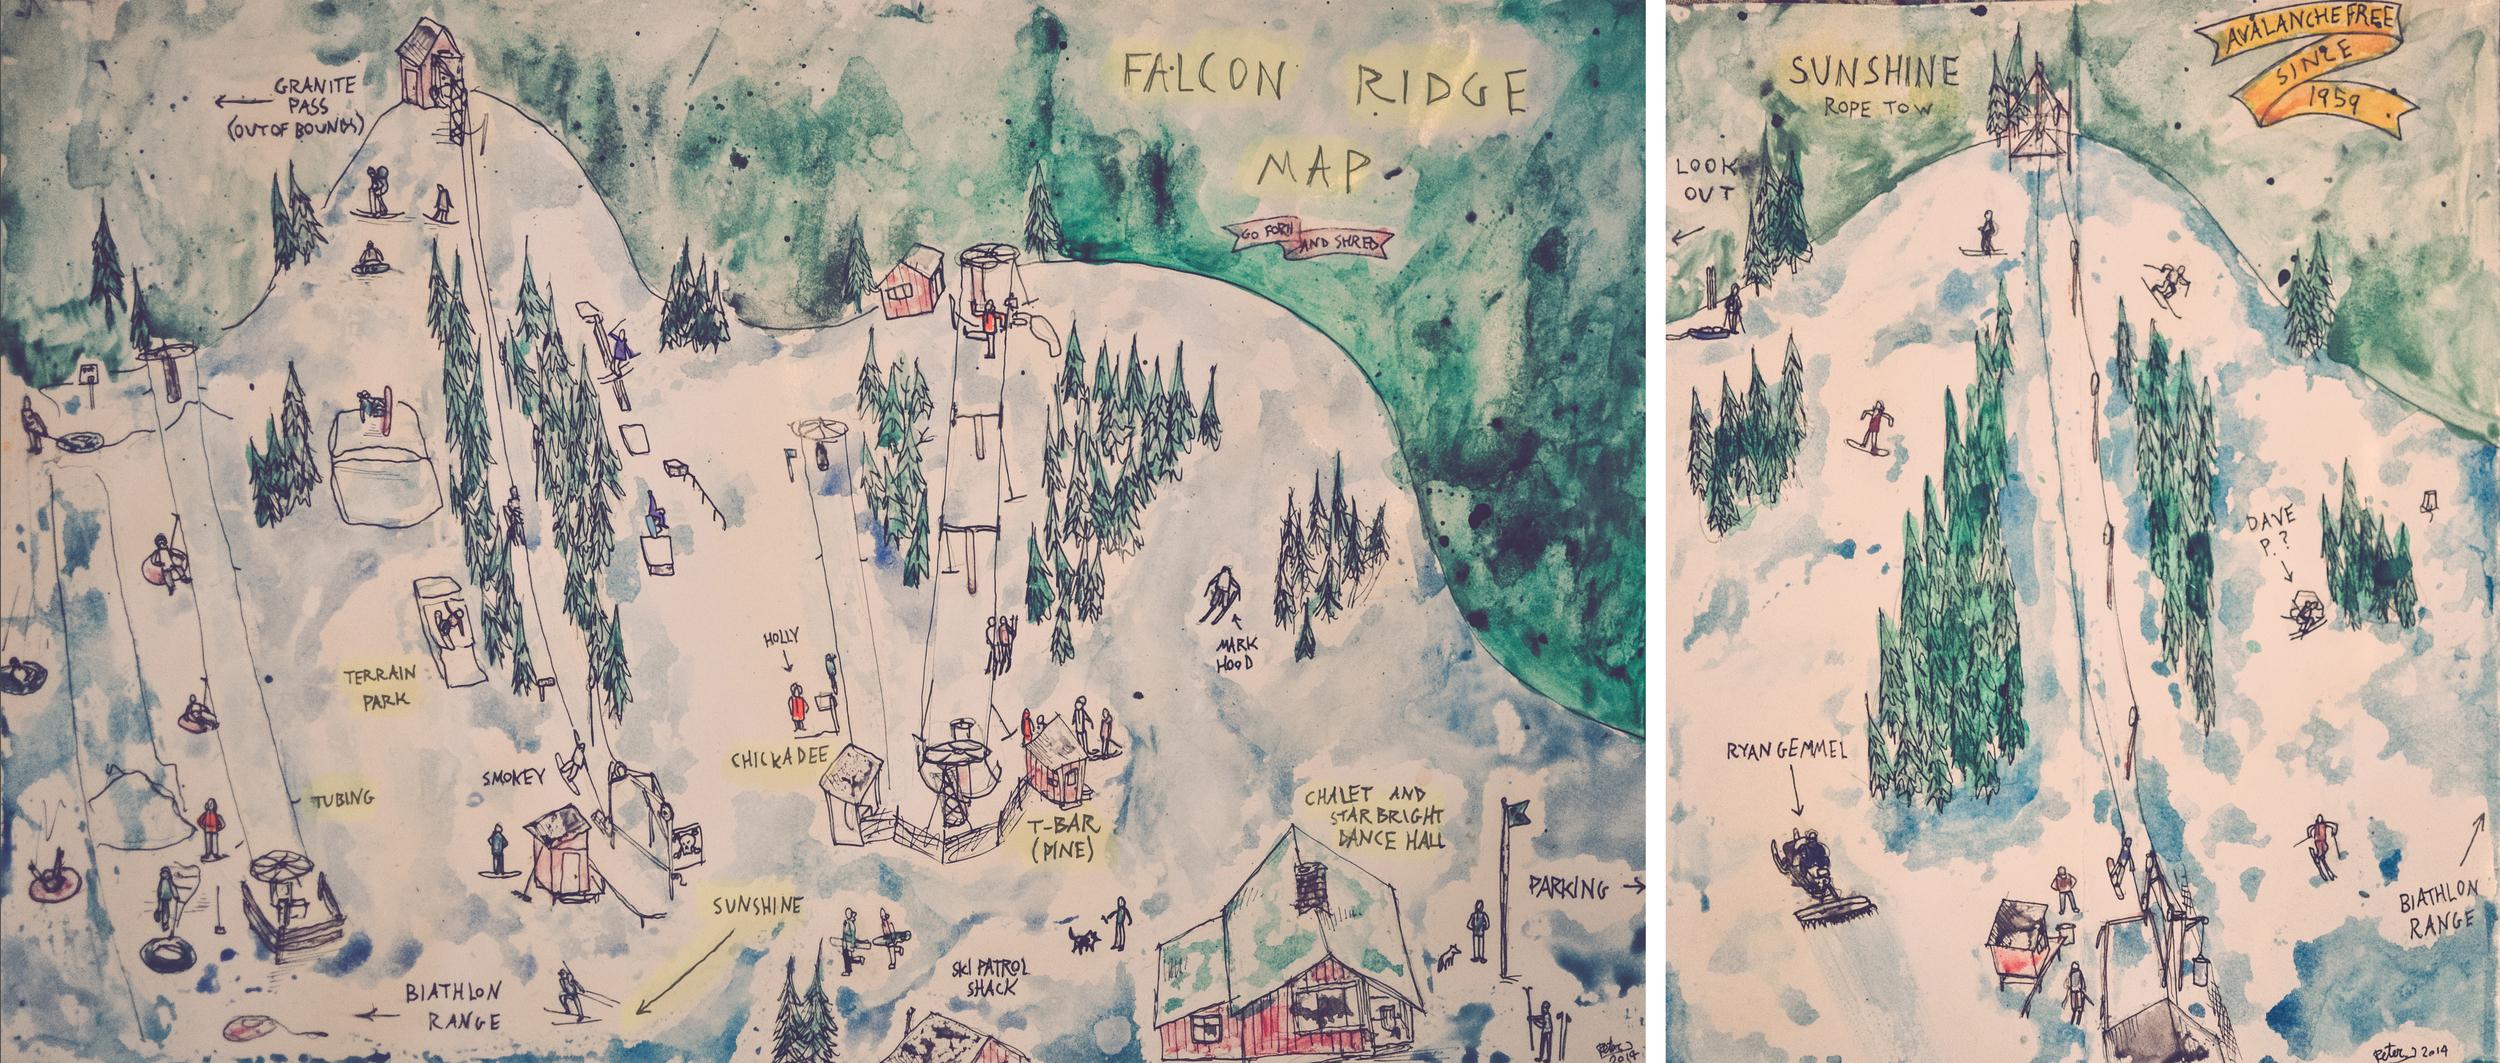 Download the Falcon Ridge map